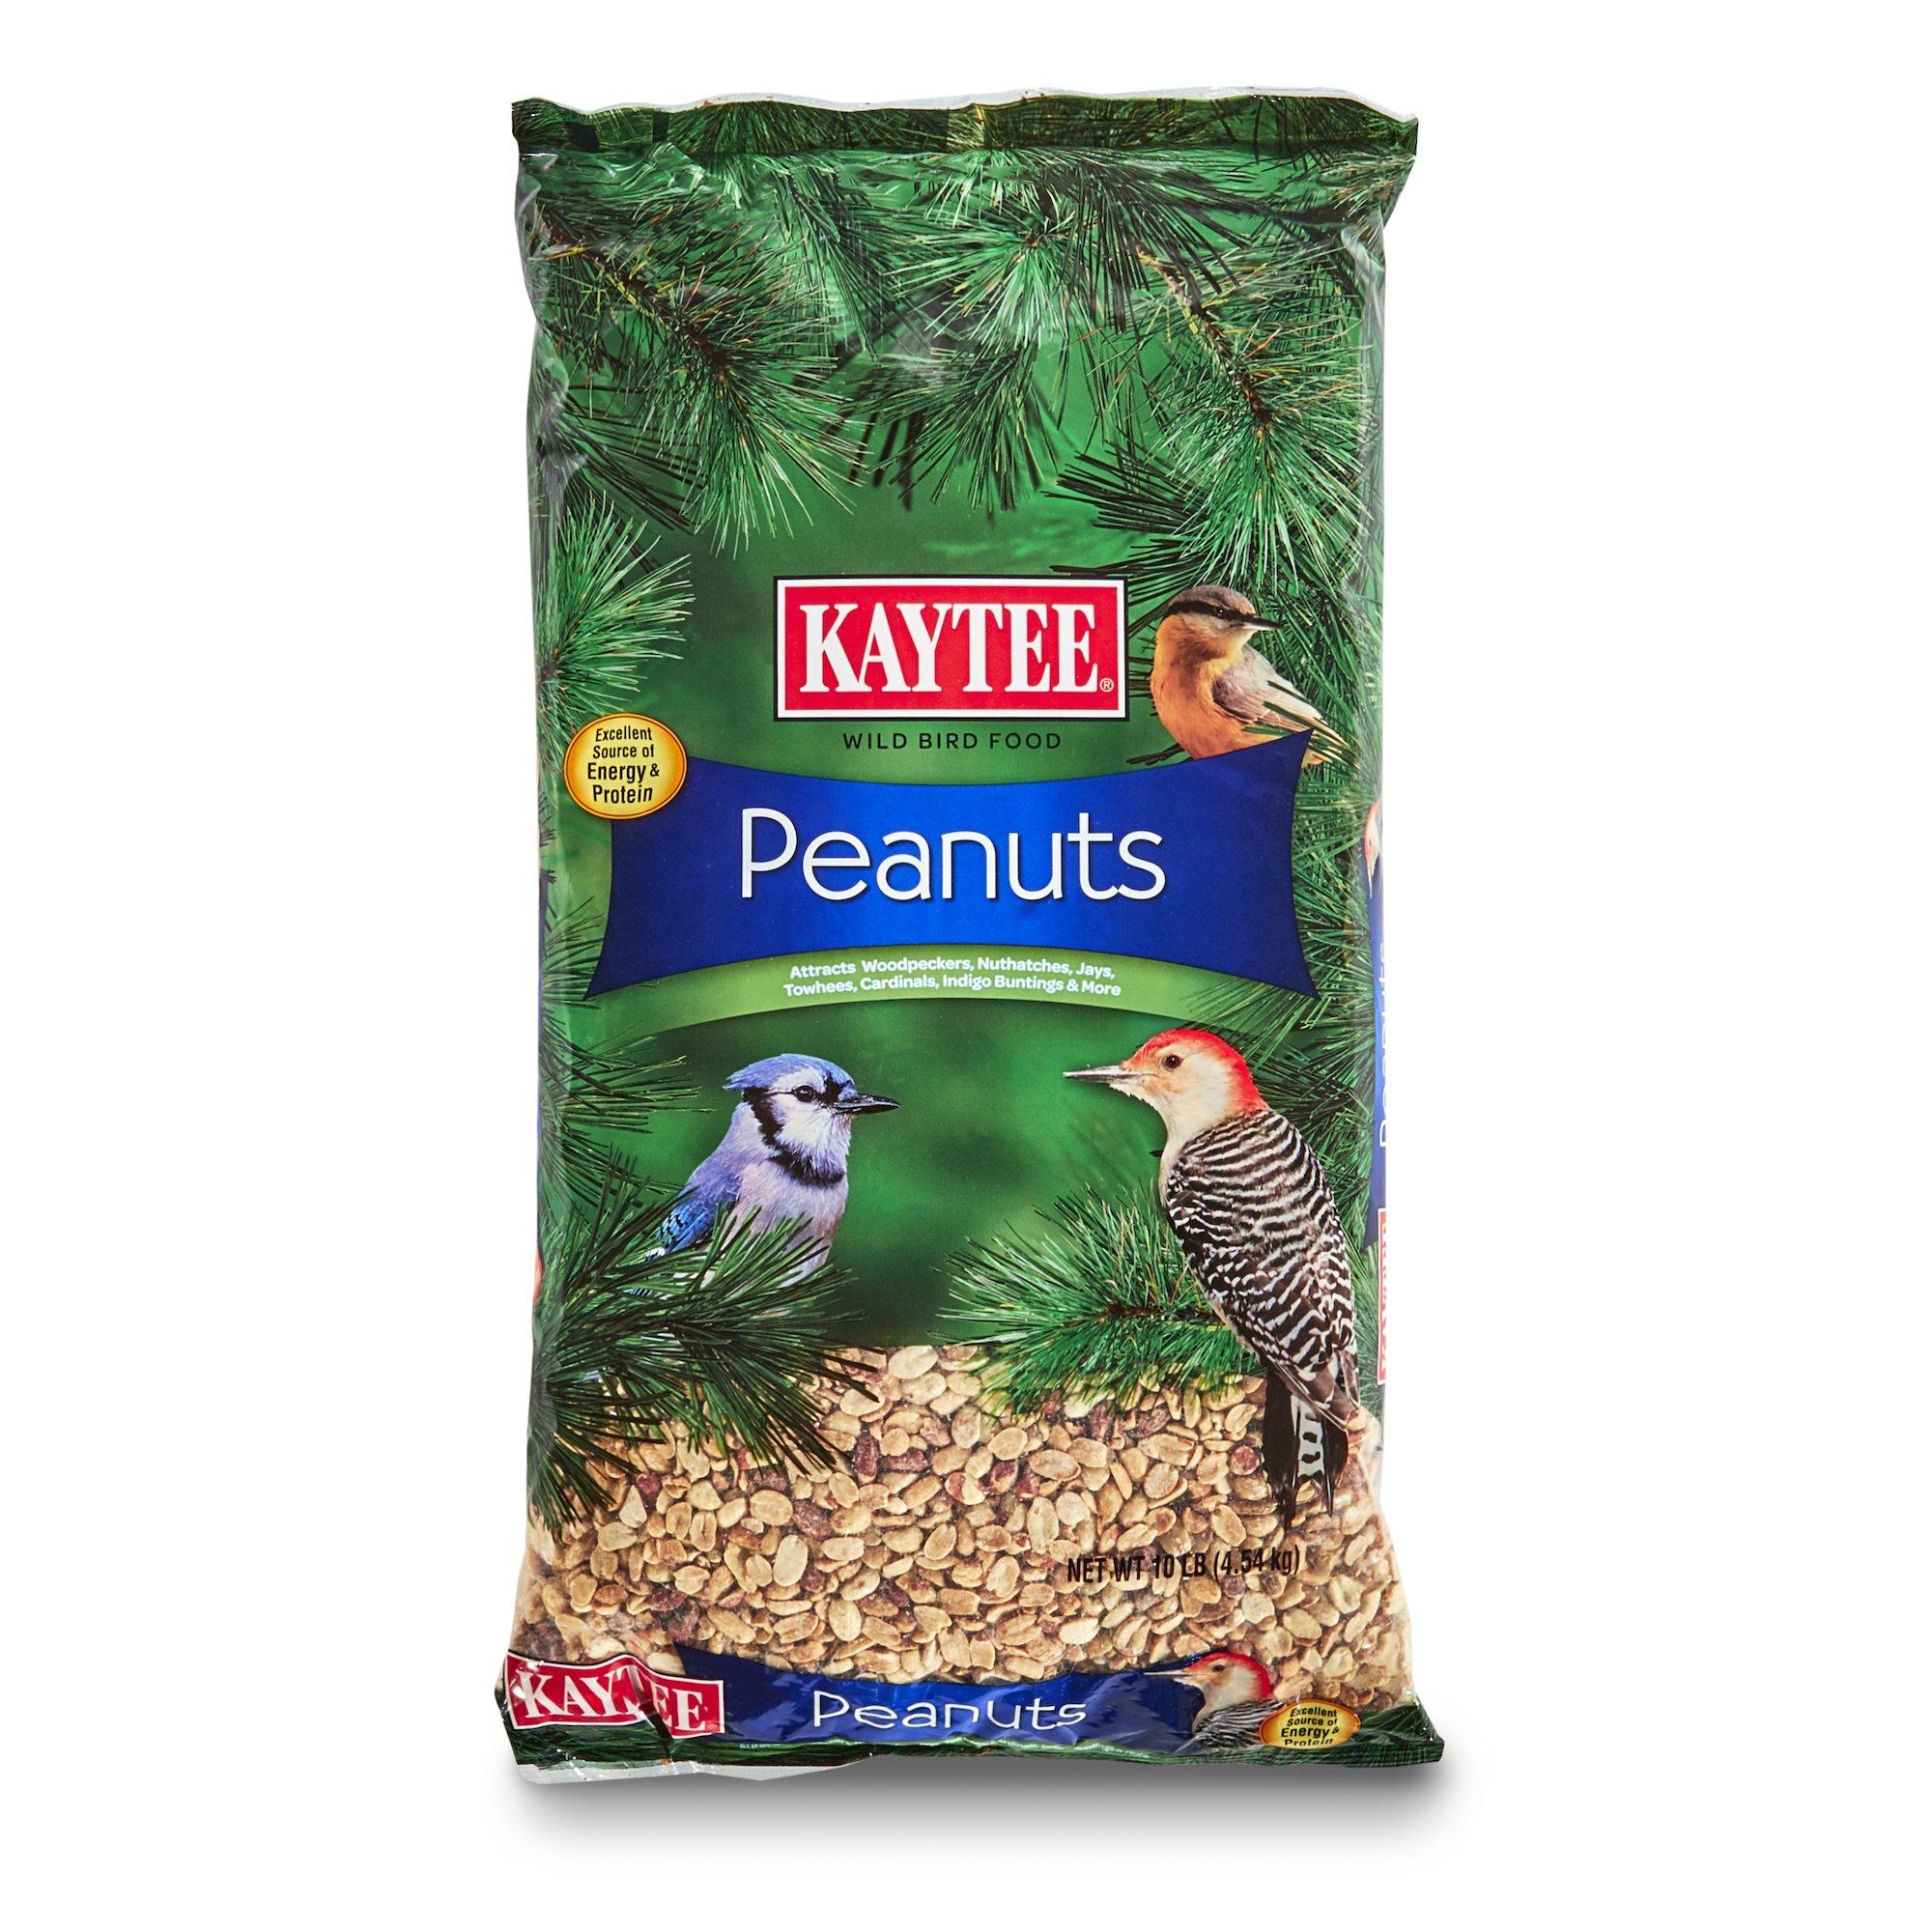 Kaytee Peanuts For Wild Birds, 10-Pound by Kaytee